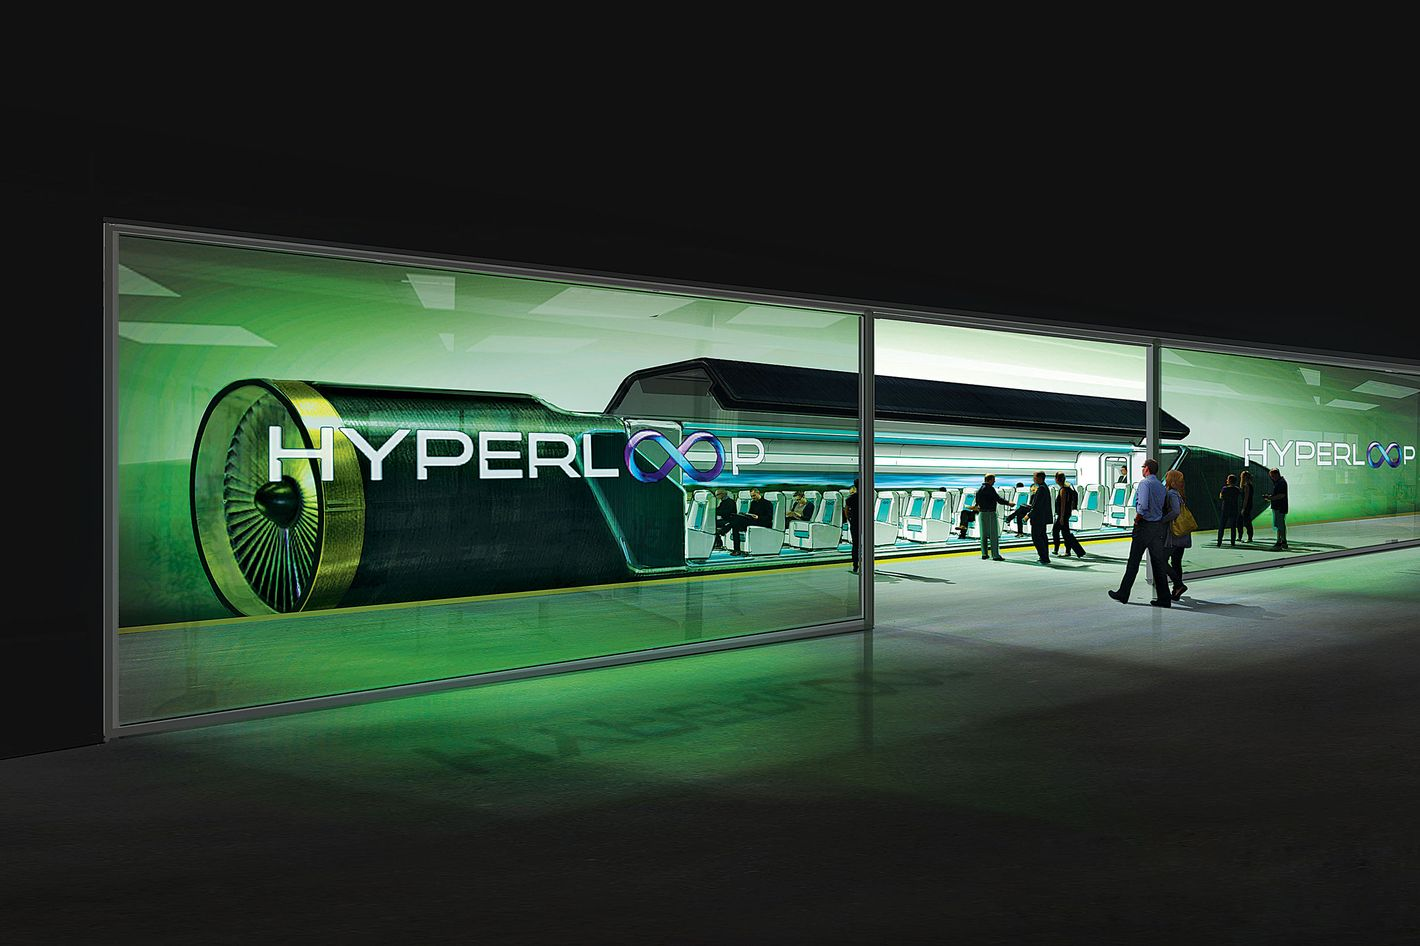 Space X Hyperloop Mass Transportation System Concept